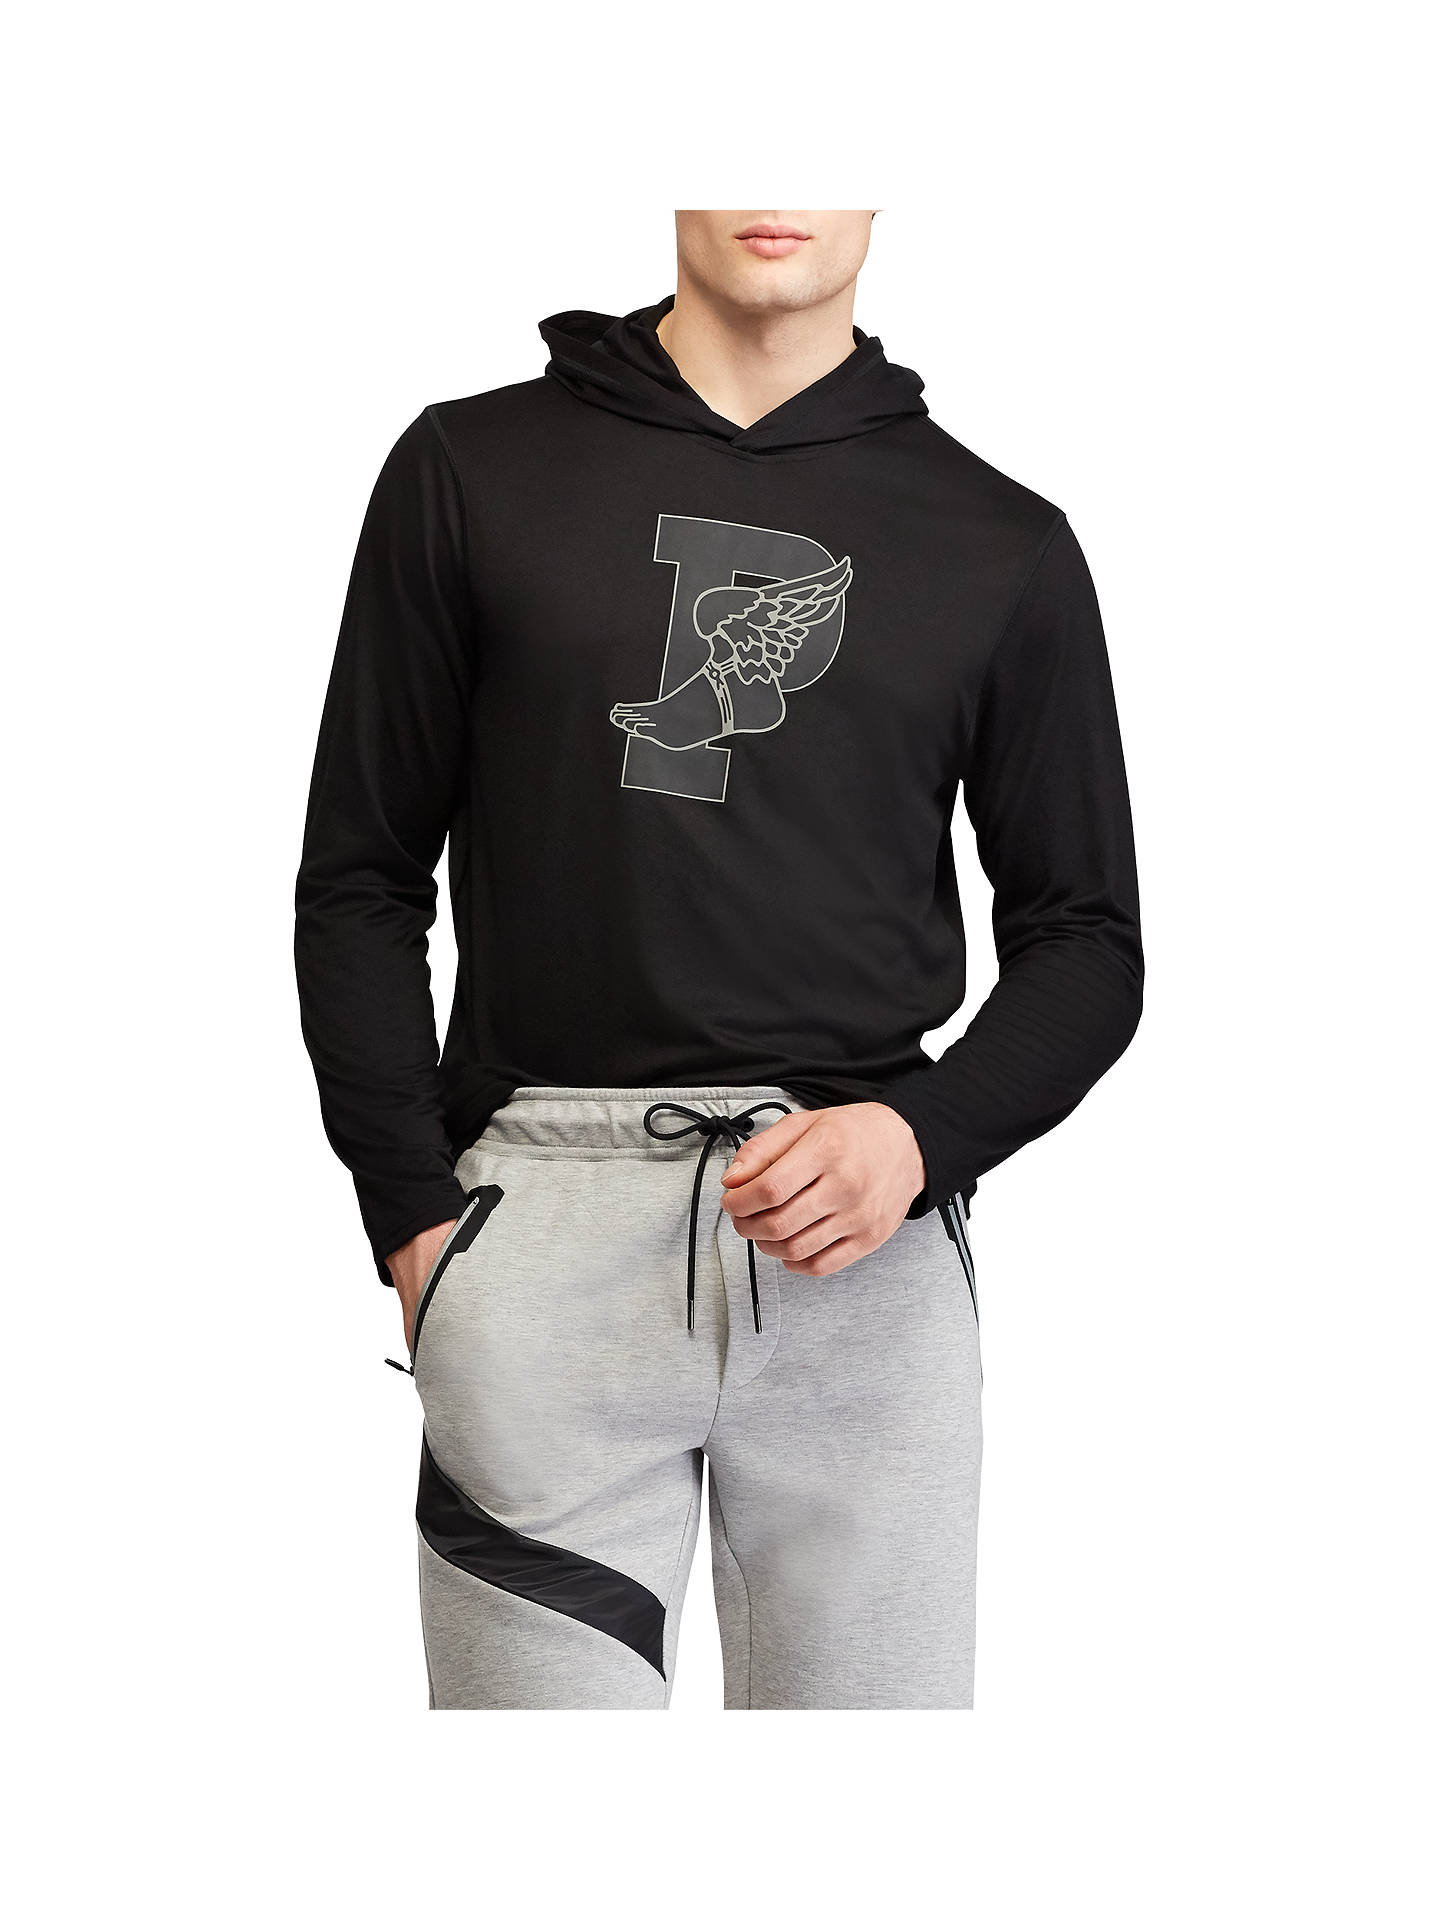 983fca0294bb3 ... Buy Polo Ralph Lauren Sweatshirt, Polo Black, XL Online at  johnlewis.com ...